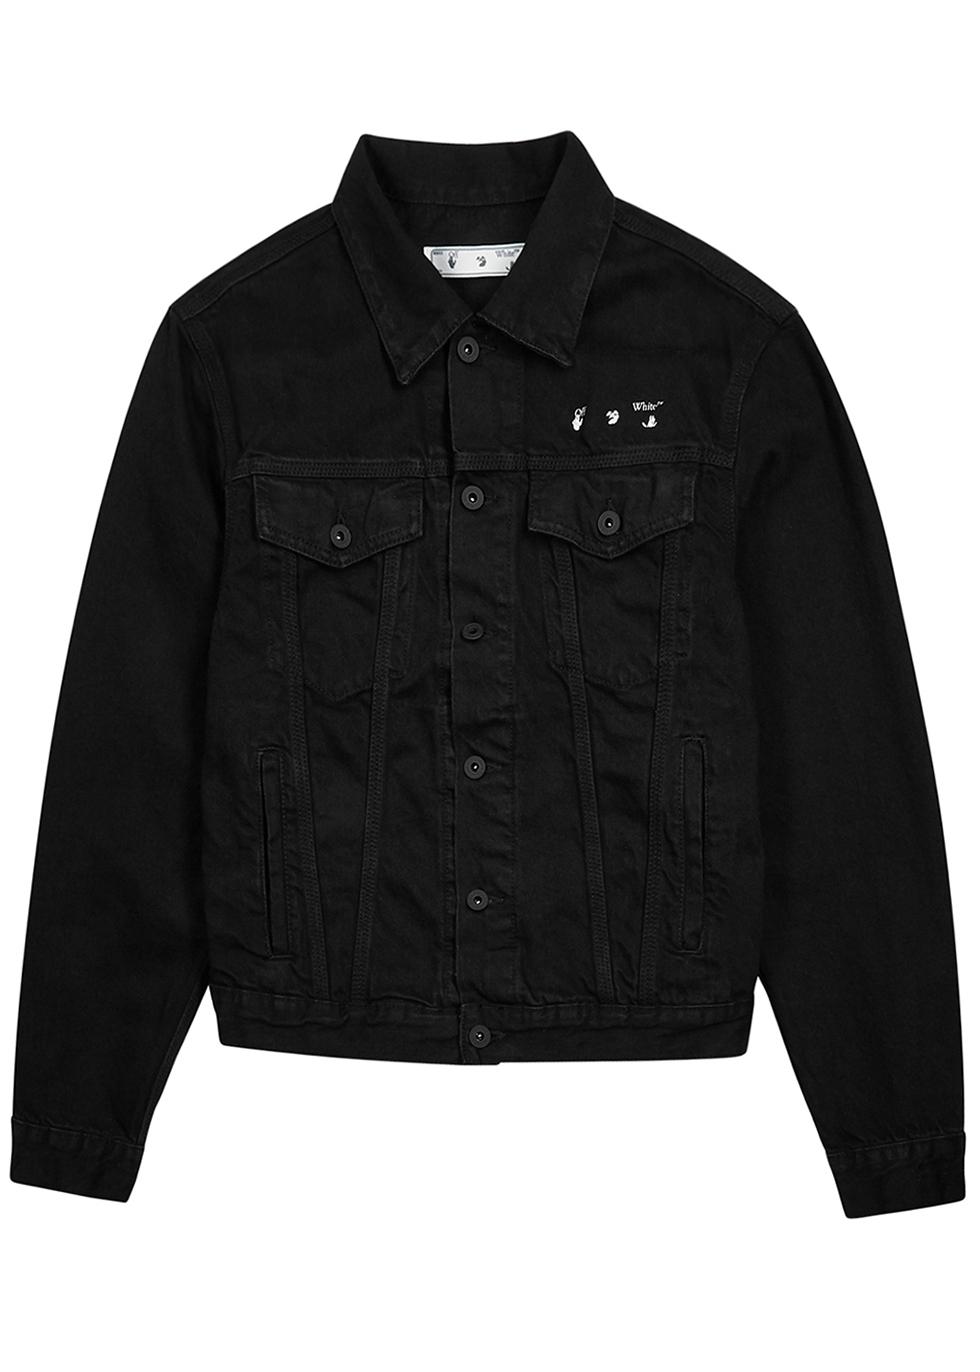 Marker Arrows black denim jacket